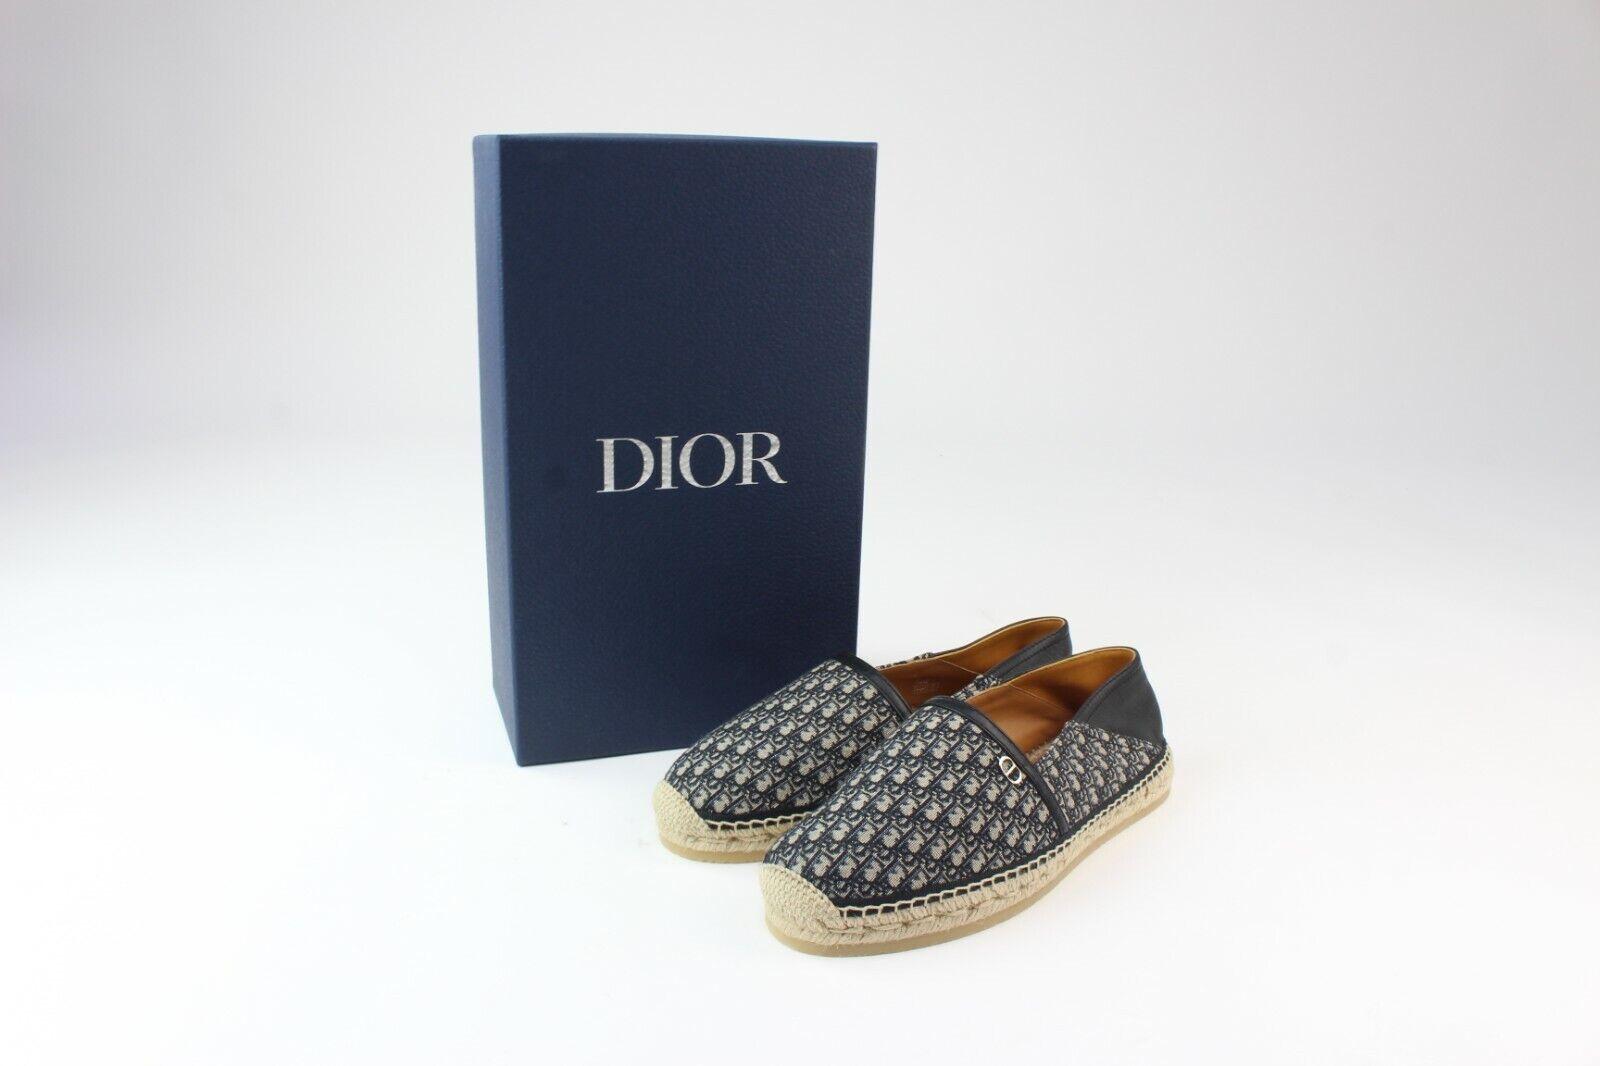 Dior Blue and Beige Oblique Paradise Espadrille EU42 UK8 BNWB